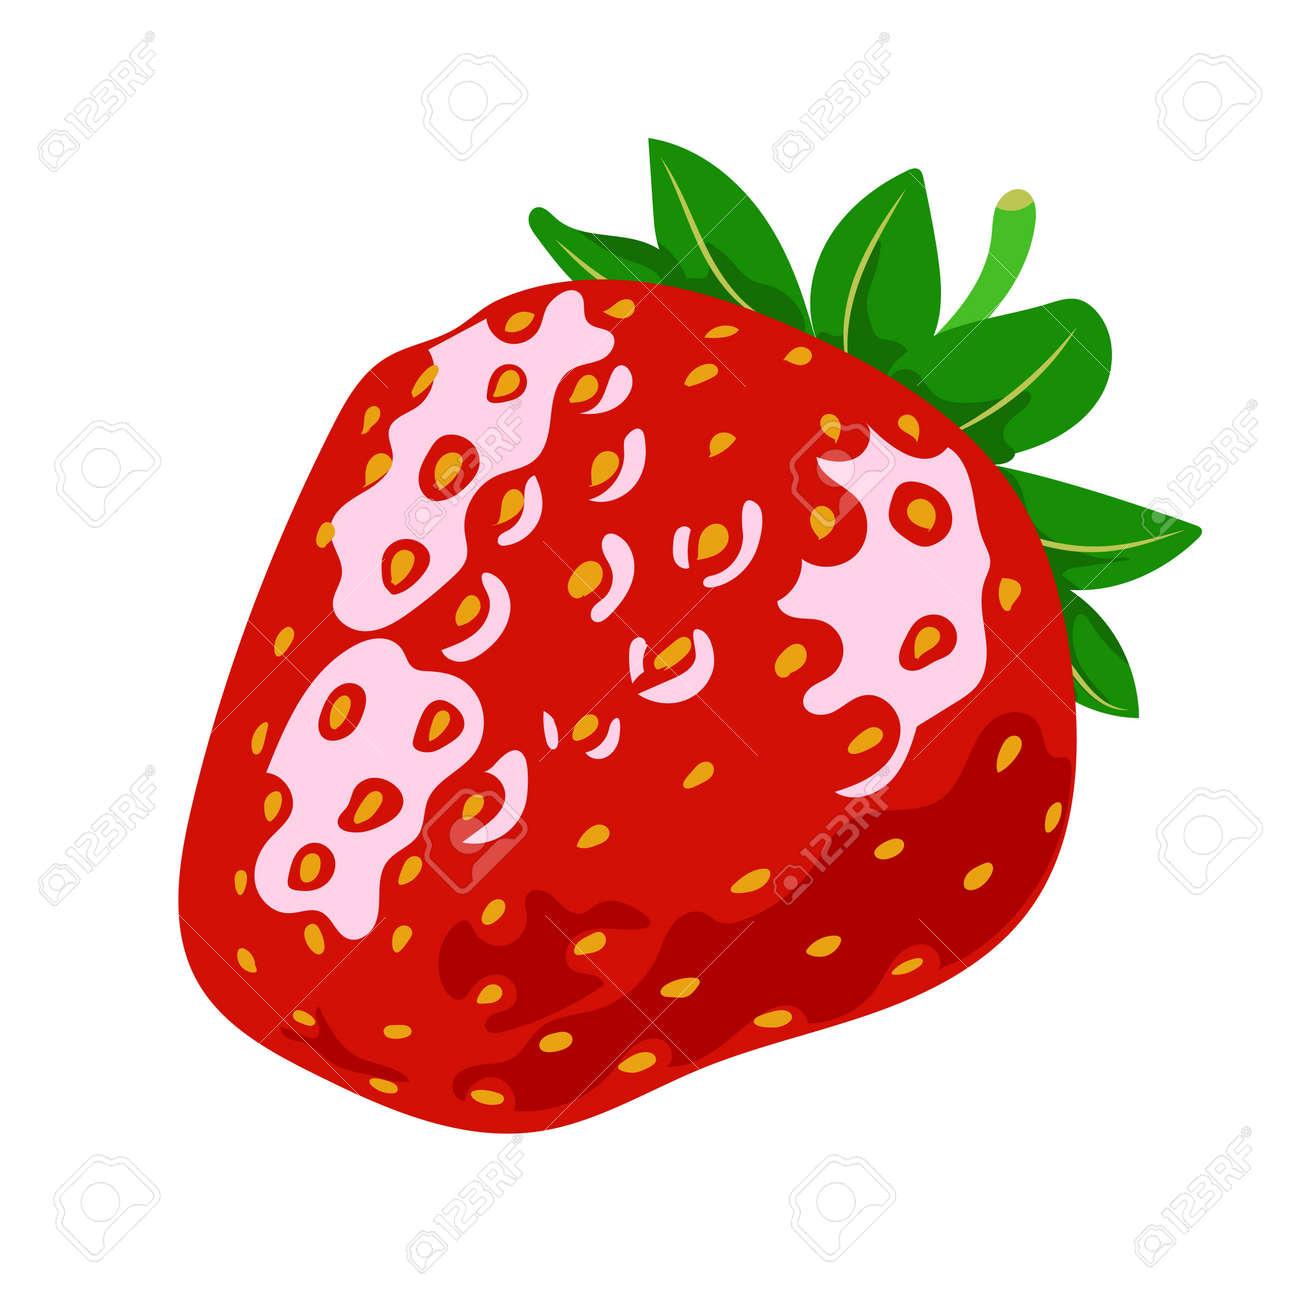 Red ripe strawberries, summer seasonal fruits, fruit print, juicy red strawberries, vector illustration in flat style - 168197654